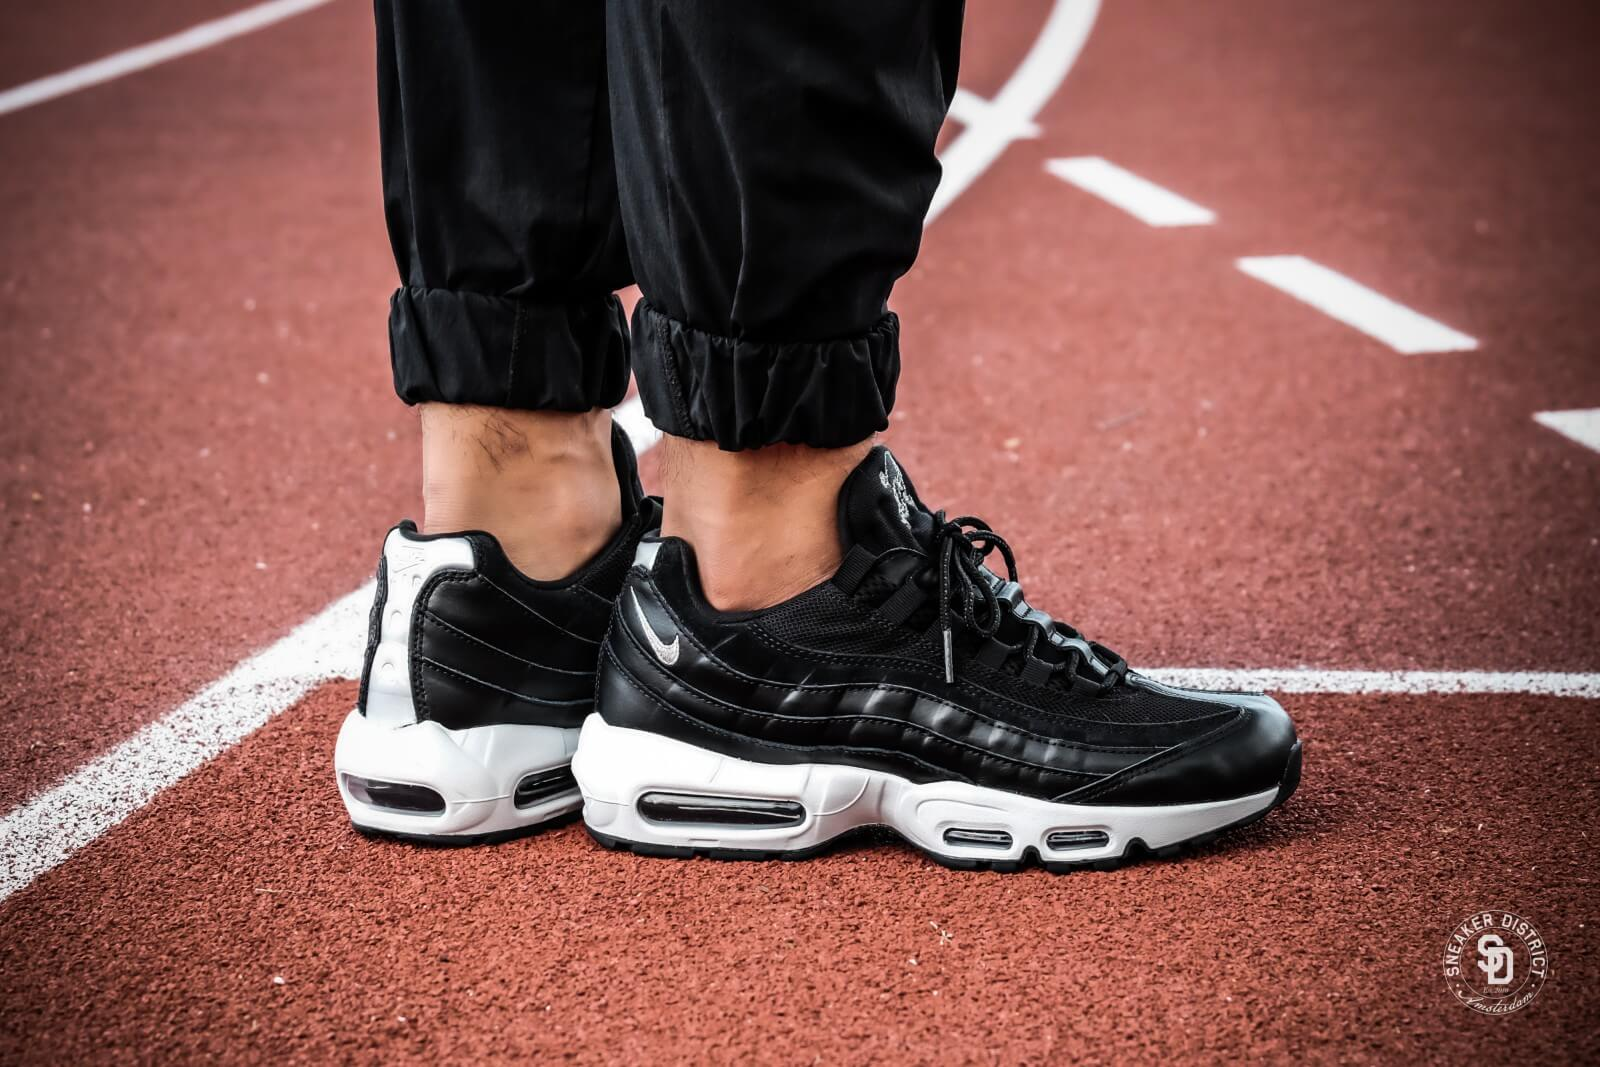 Nike Air Max 95 PRM Skull BlackChrome Off White 538416 008